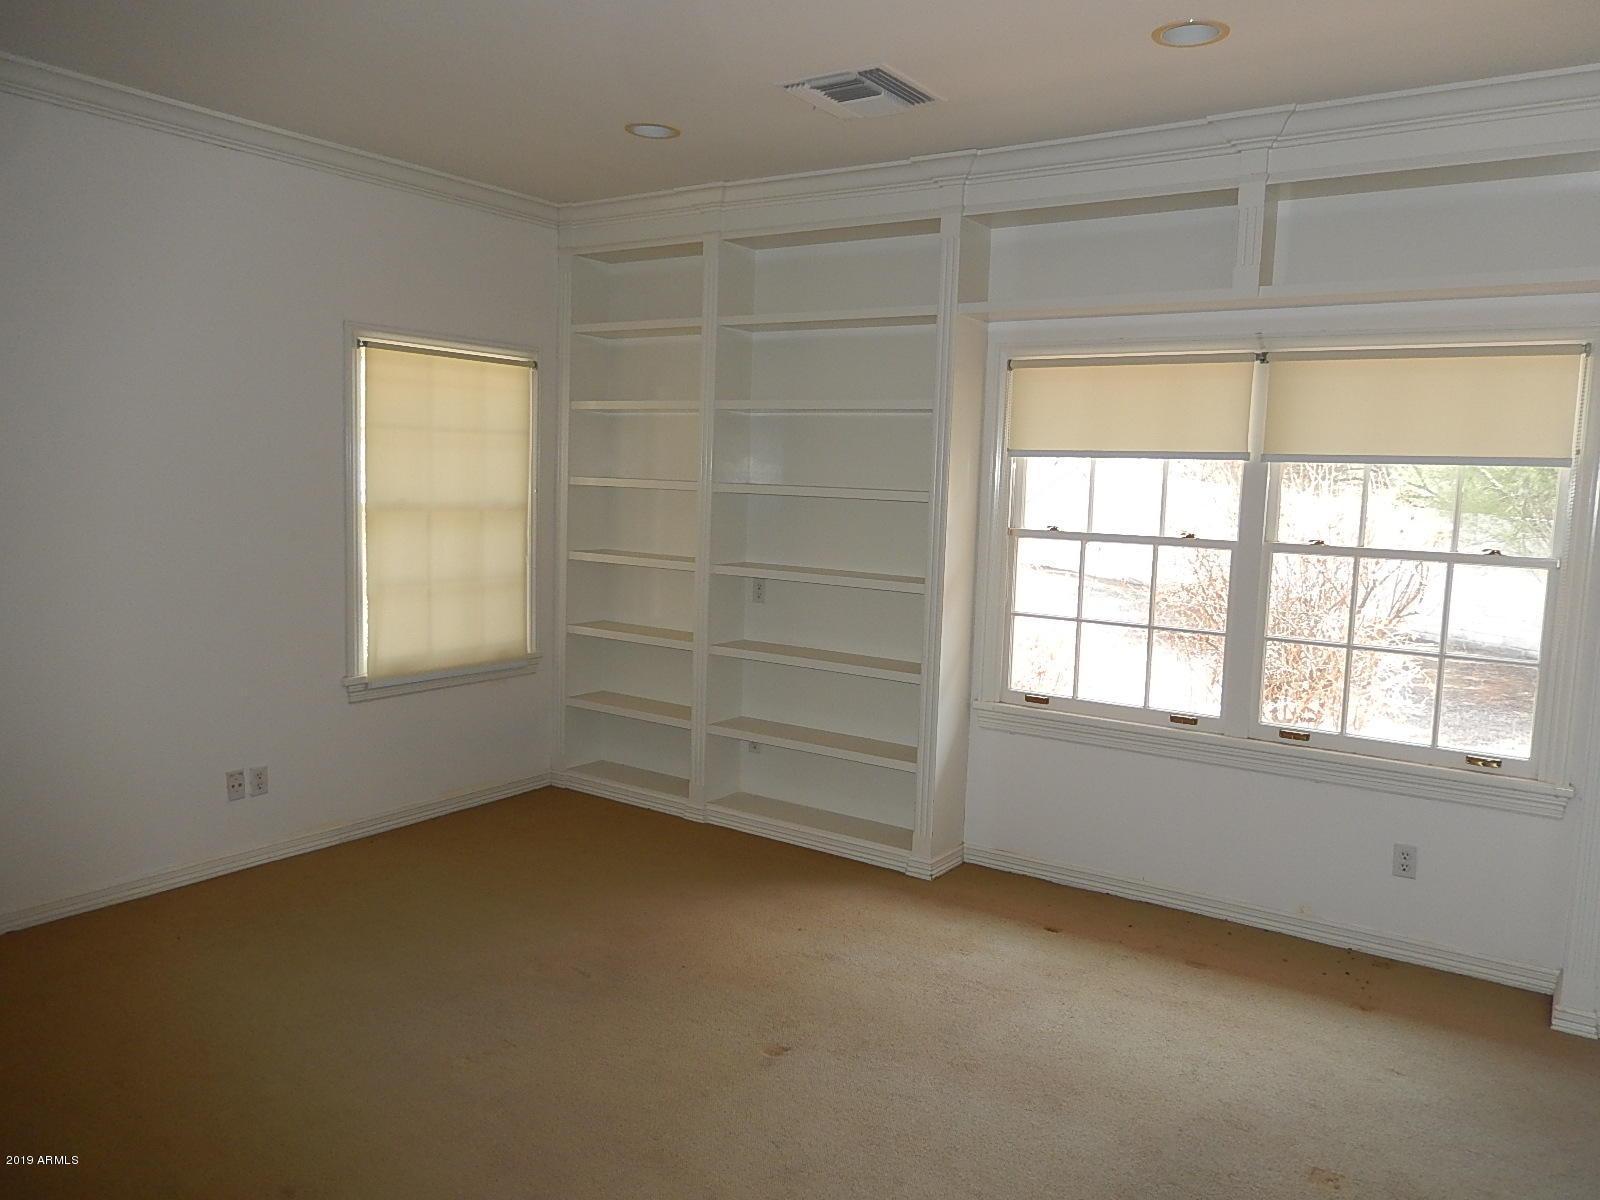 MLS 5928994 4805 E VALLEY VISTA Lane, Paradise Valley, AZ 85253 Paradise Valley AZ REO Bank Owned Foreclosure